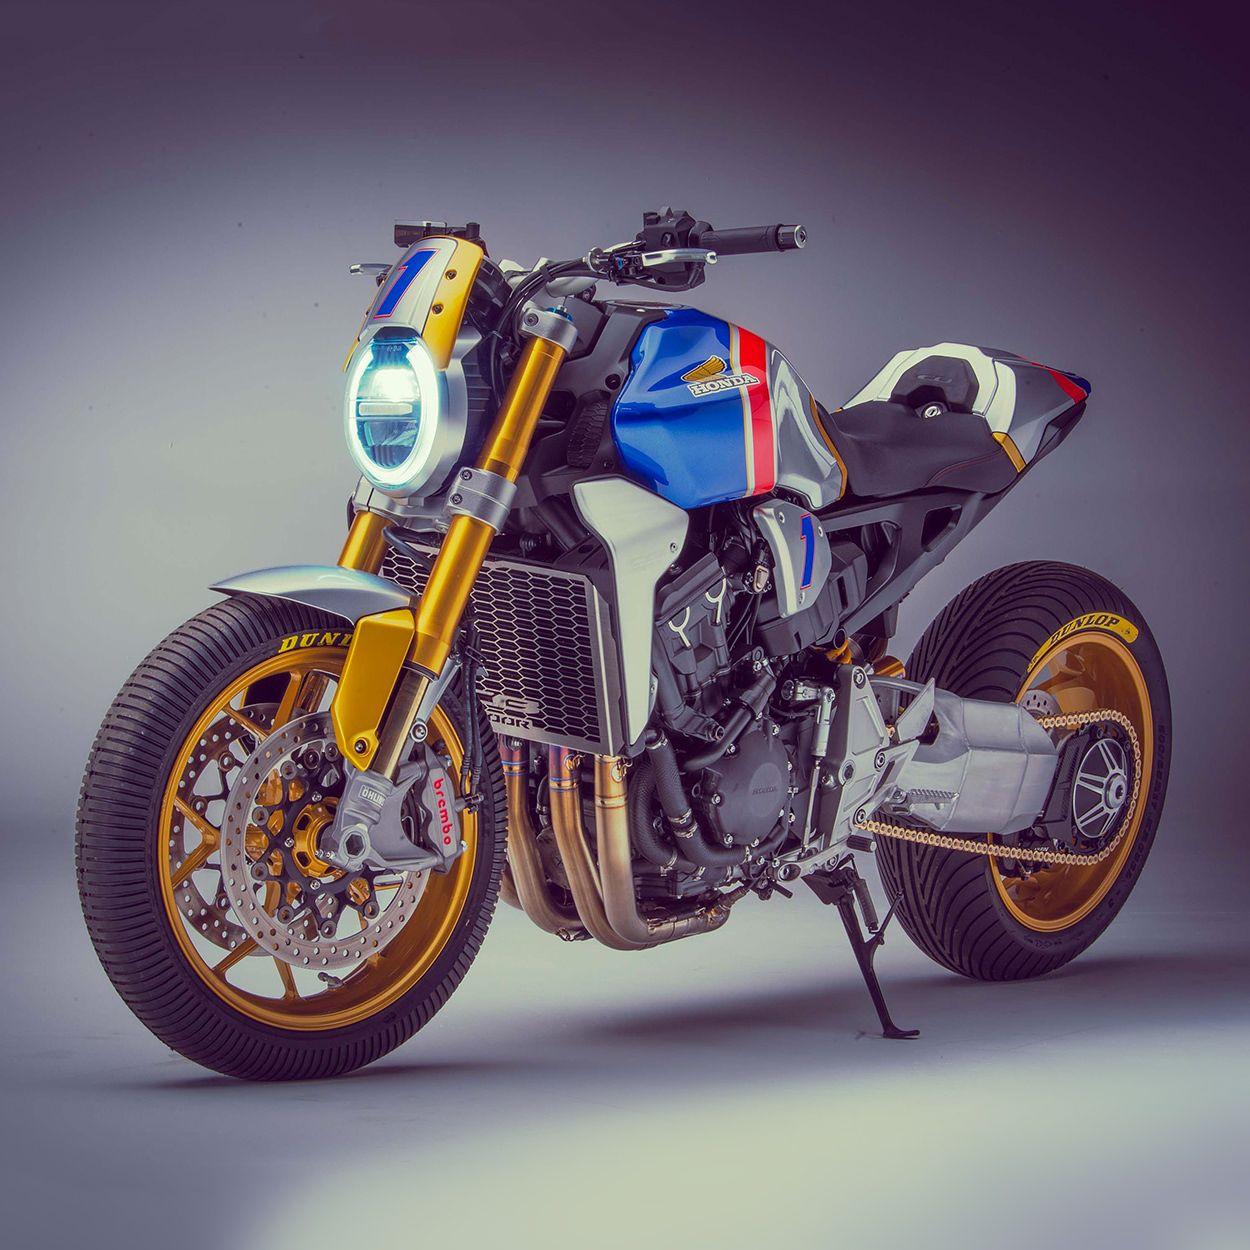 Custom Bikes Of The Week 2 September 2018 Honda Cb Japanese Motorcycle Sport Bikes